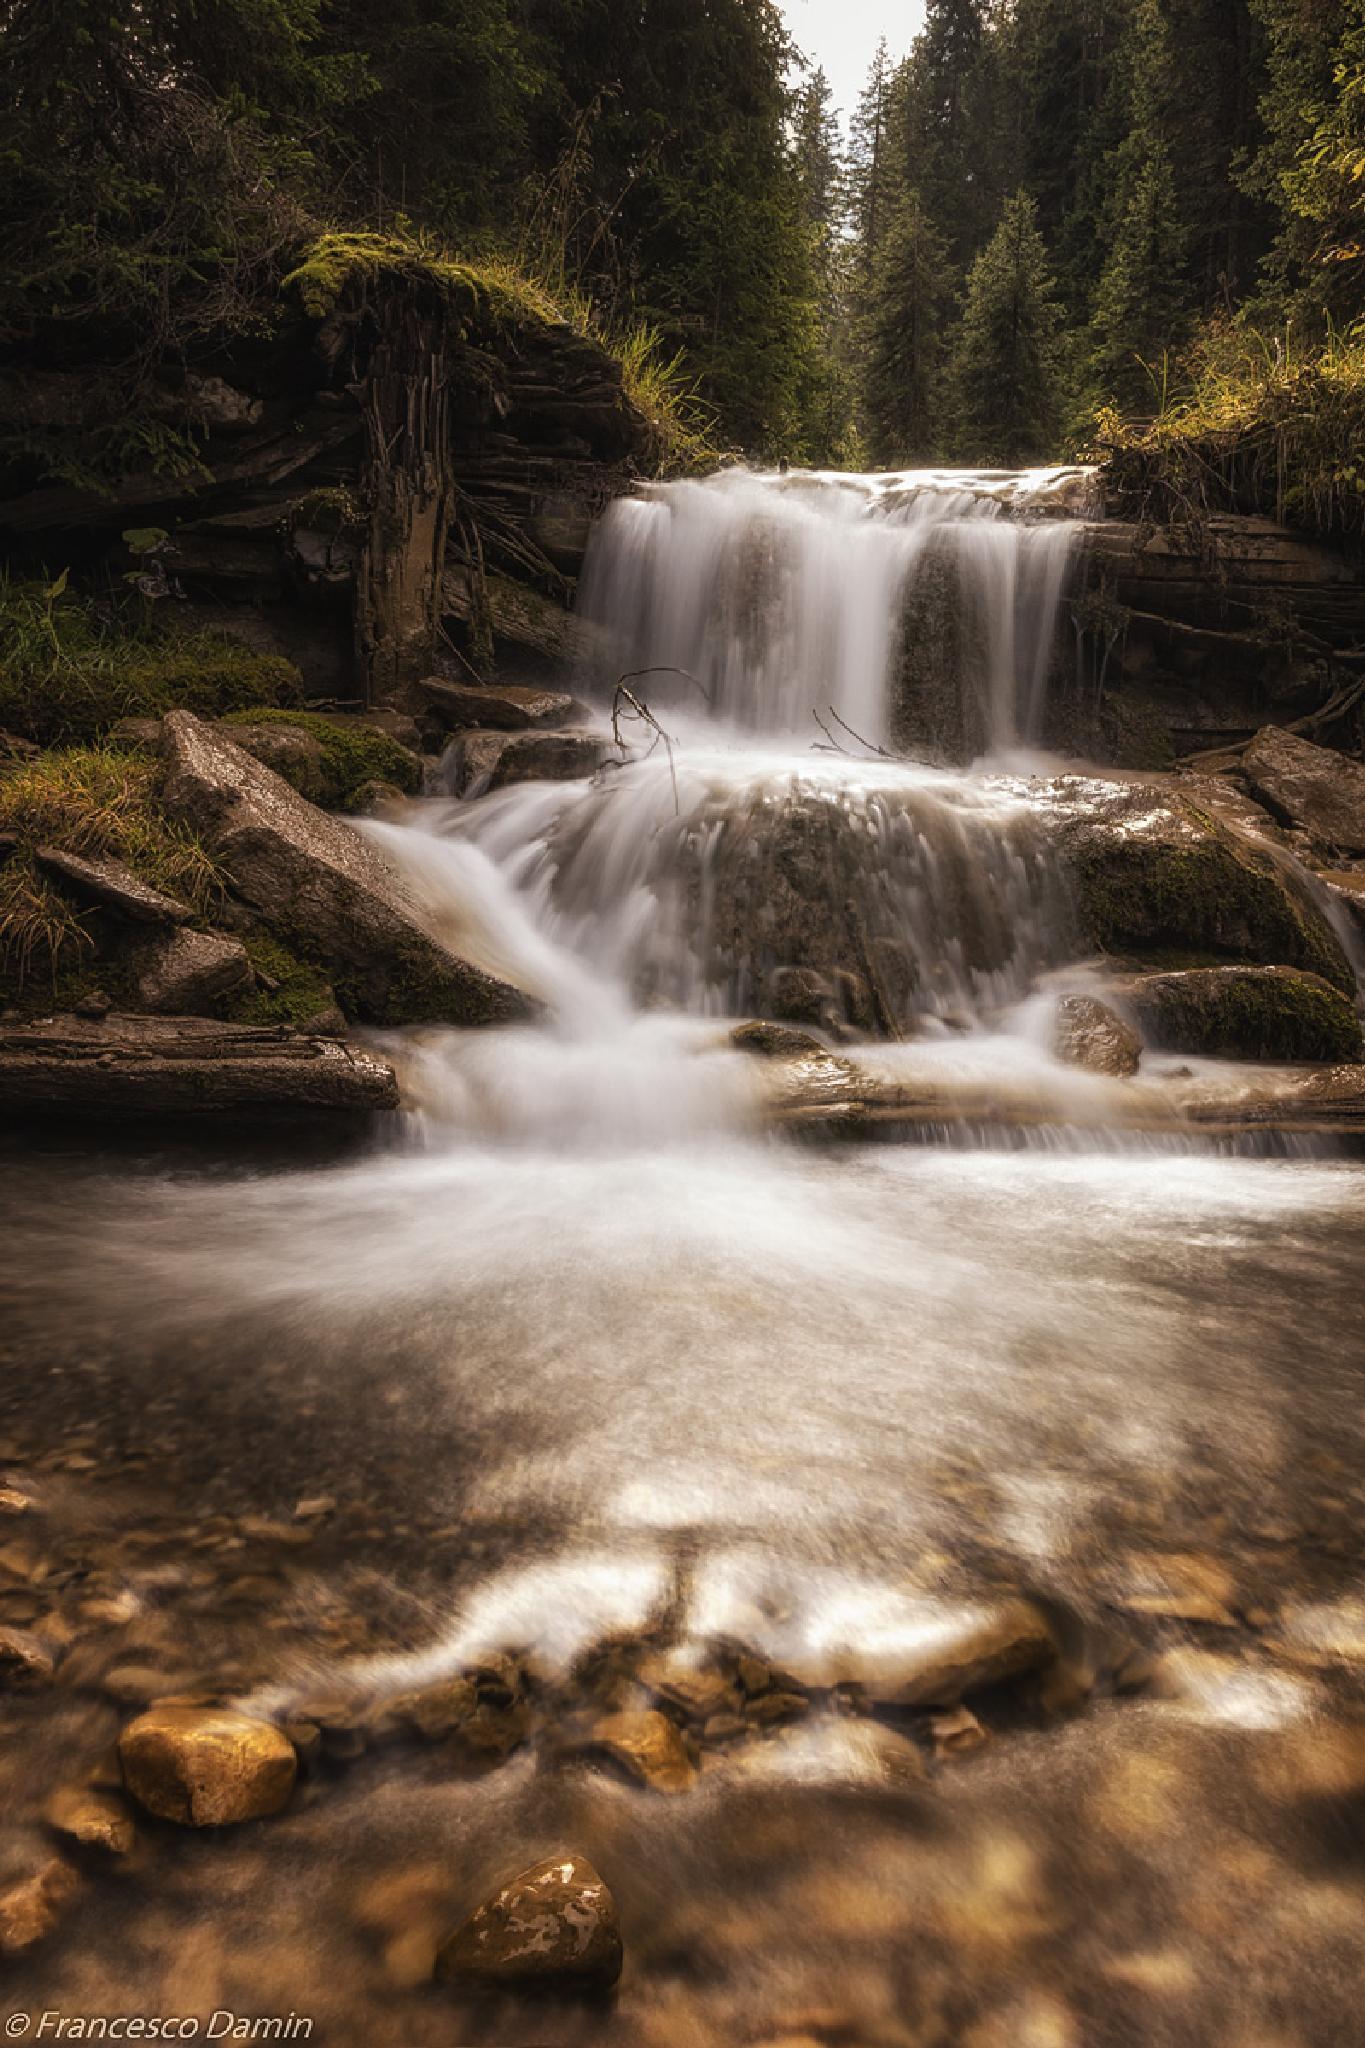 Waterfall in autumn by Francesco Damin